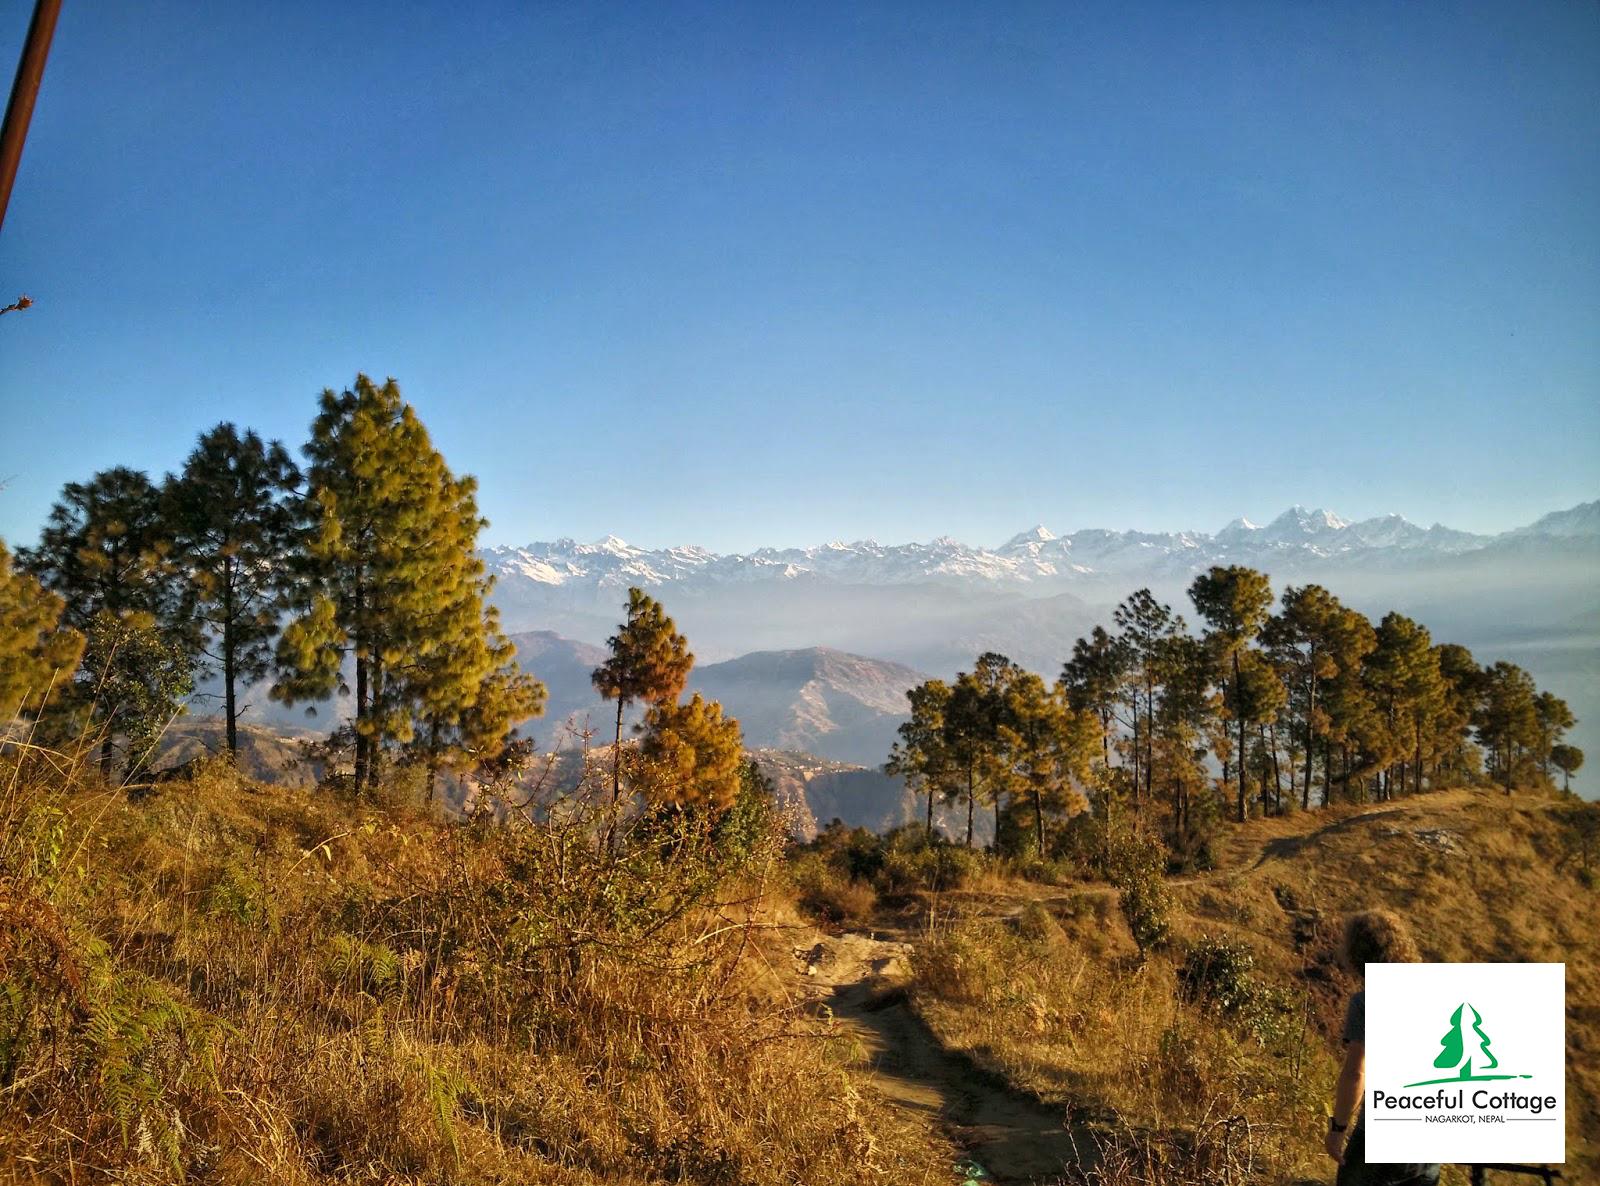 Nagarkot Panoramic Hiking Trail With Inspiring Views